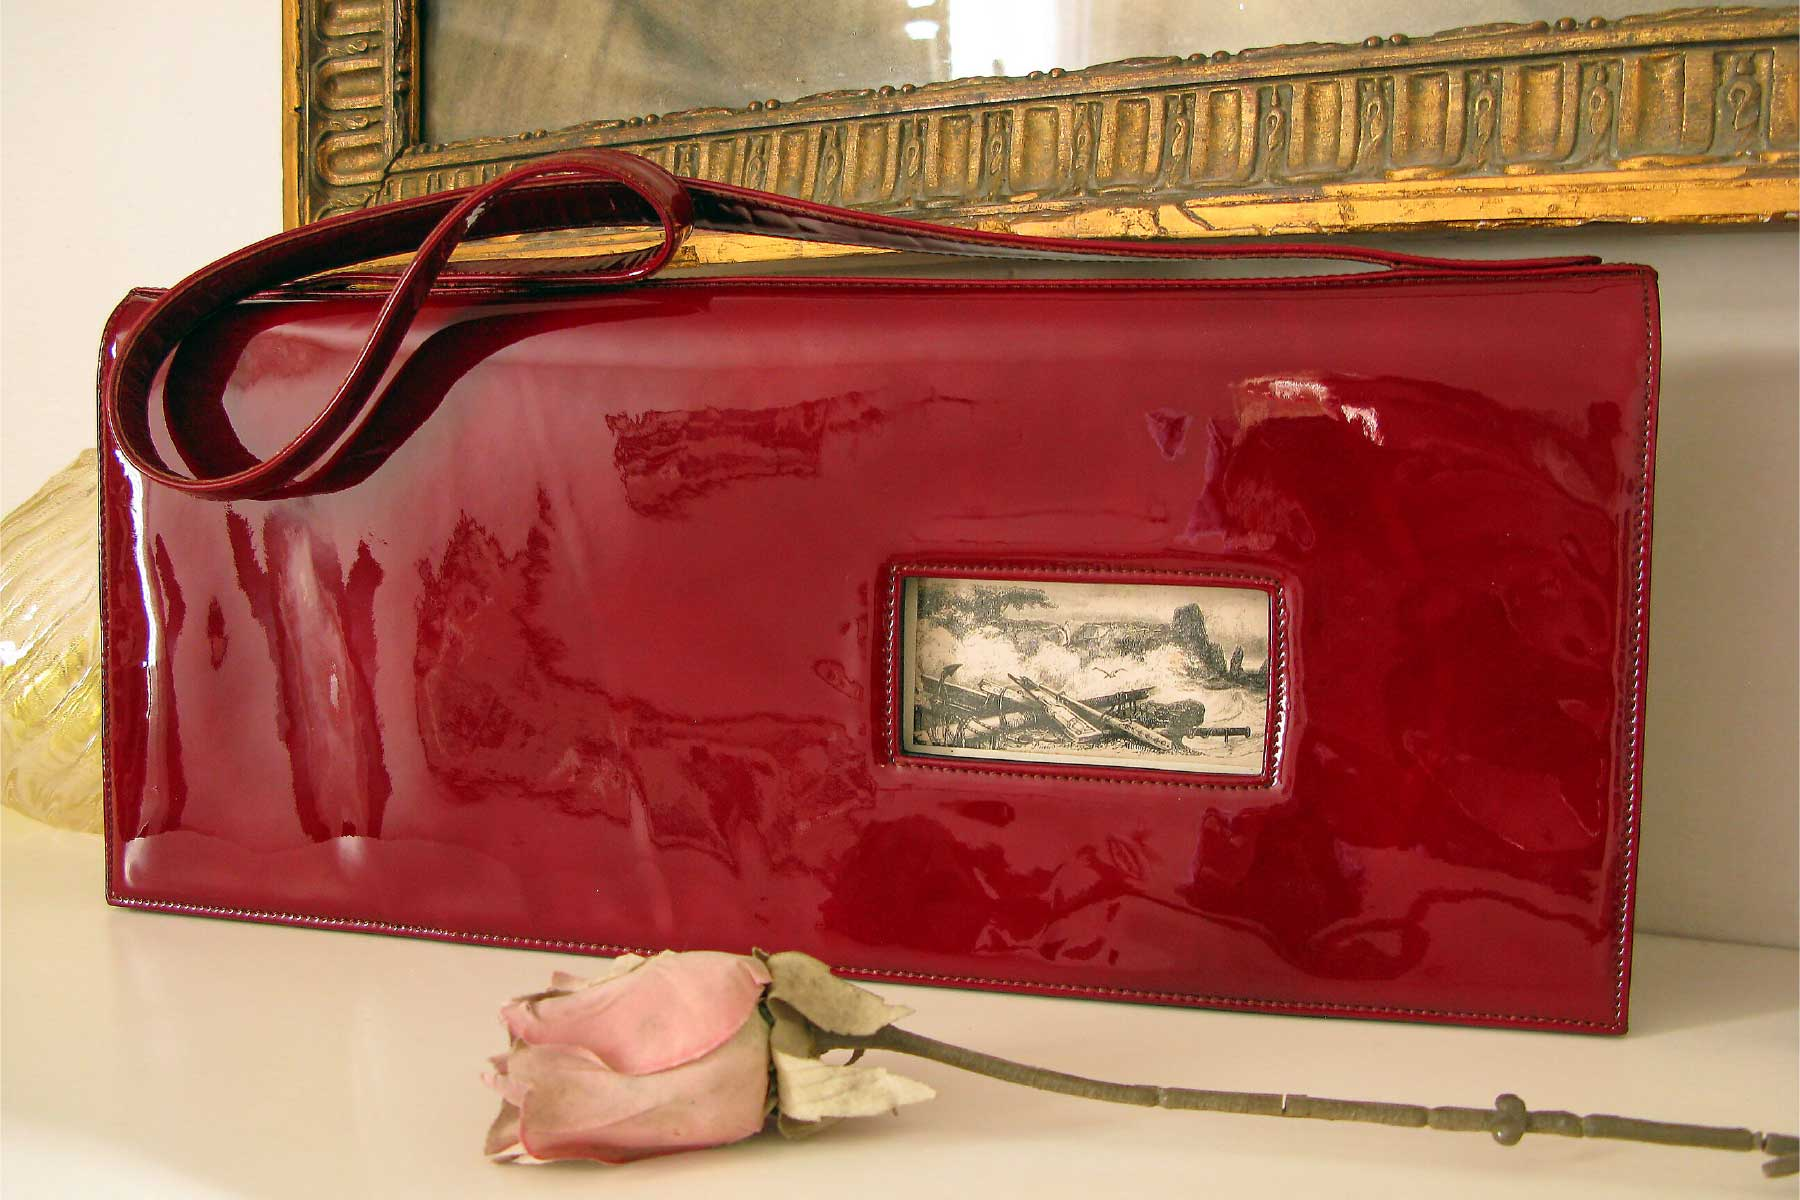 Annalisa Tessarolo Purse Storm patent leather engraving 19th century